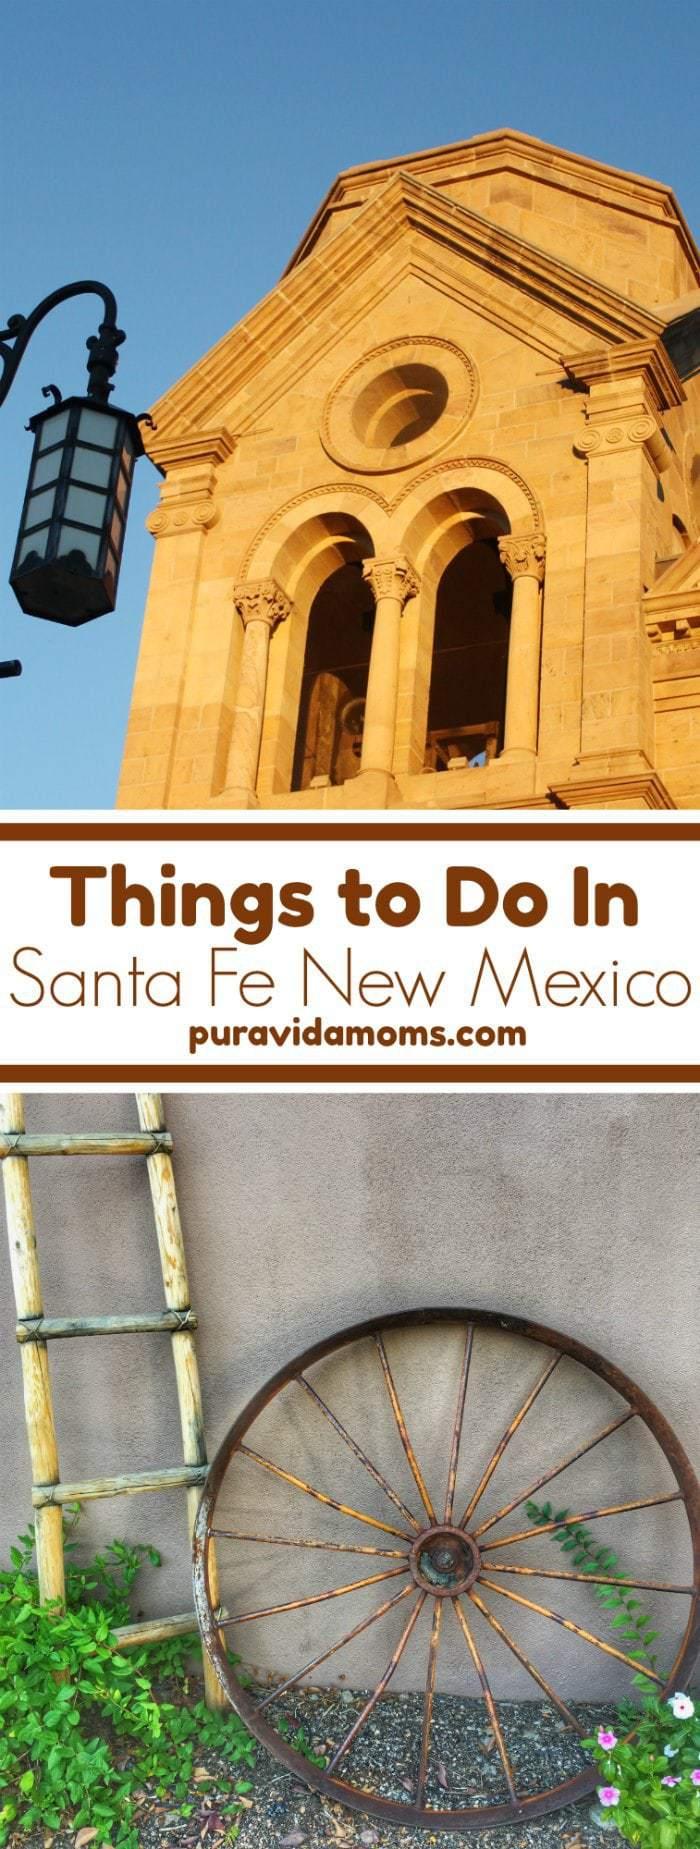 Things to do in Santa Fe New Mexico